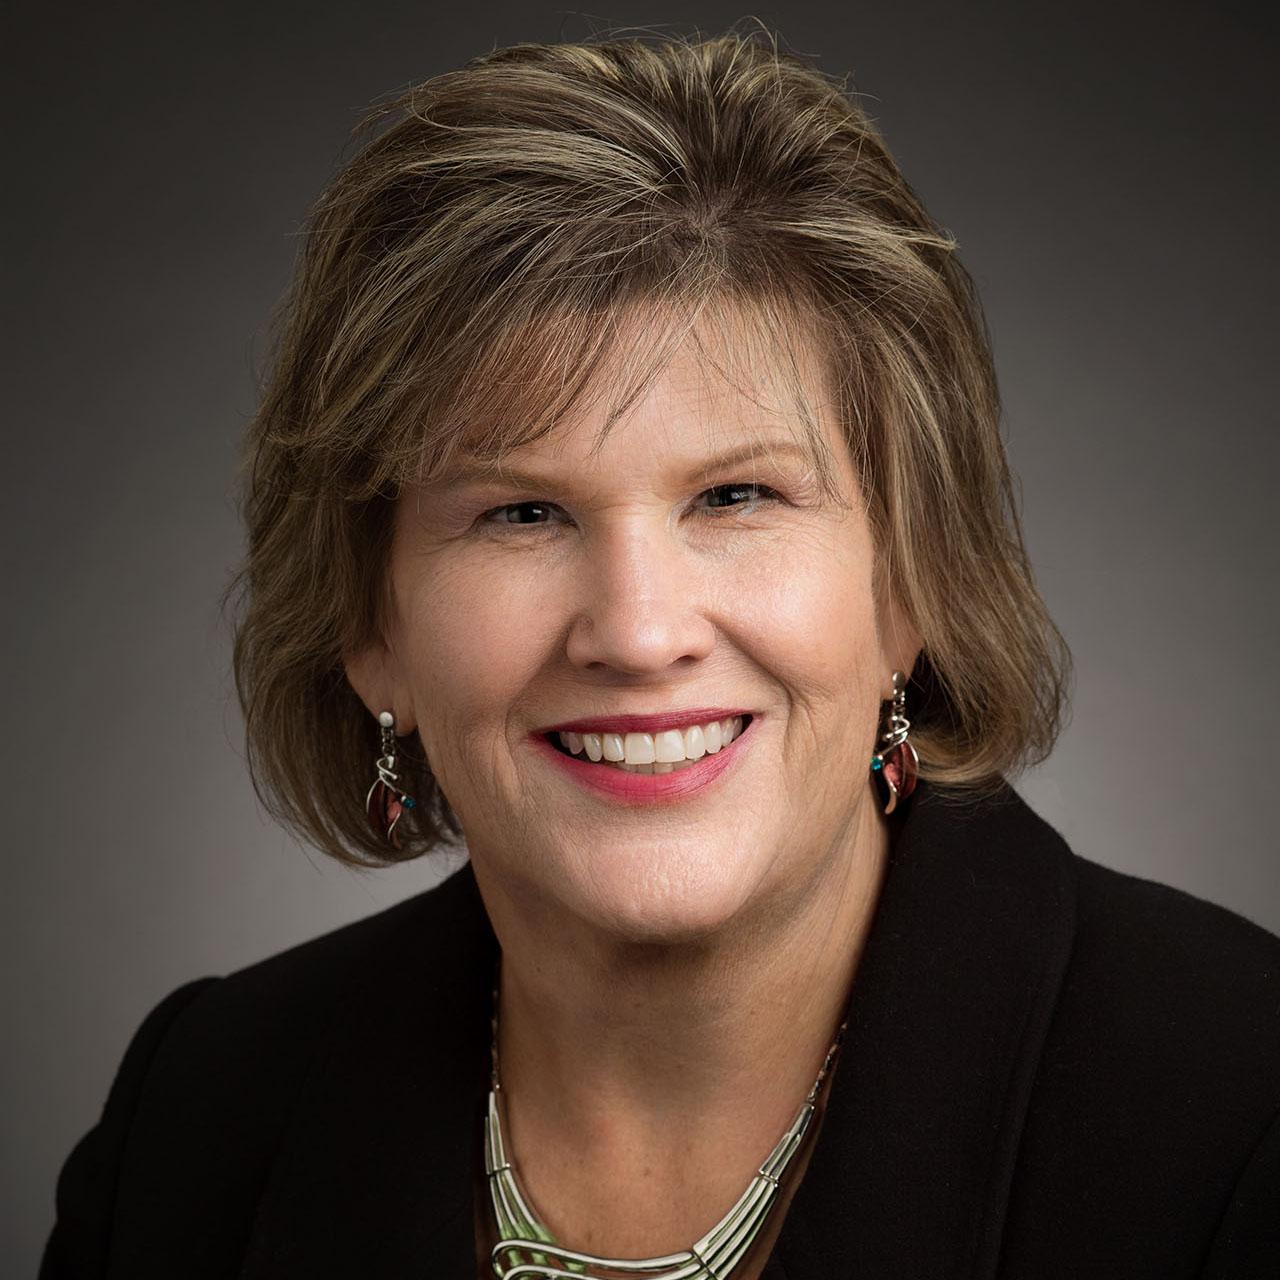 Kathryn Kaiser, MBA, BSN, RN, CJCP